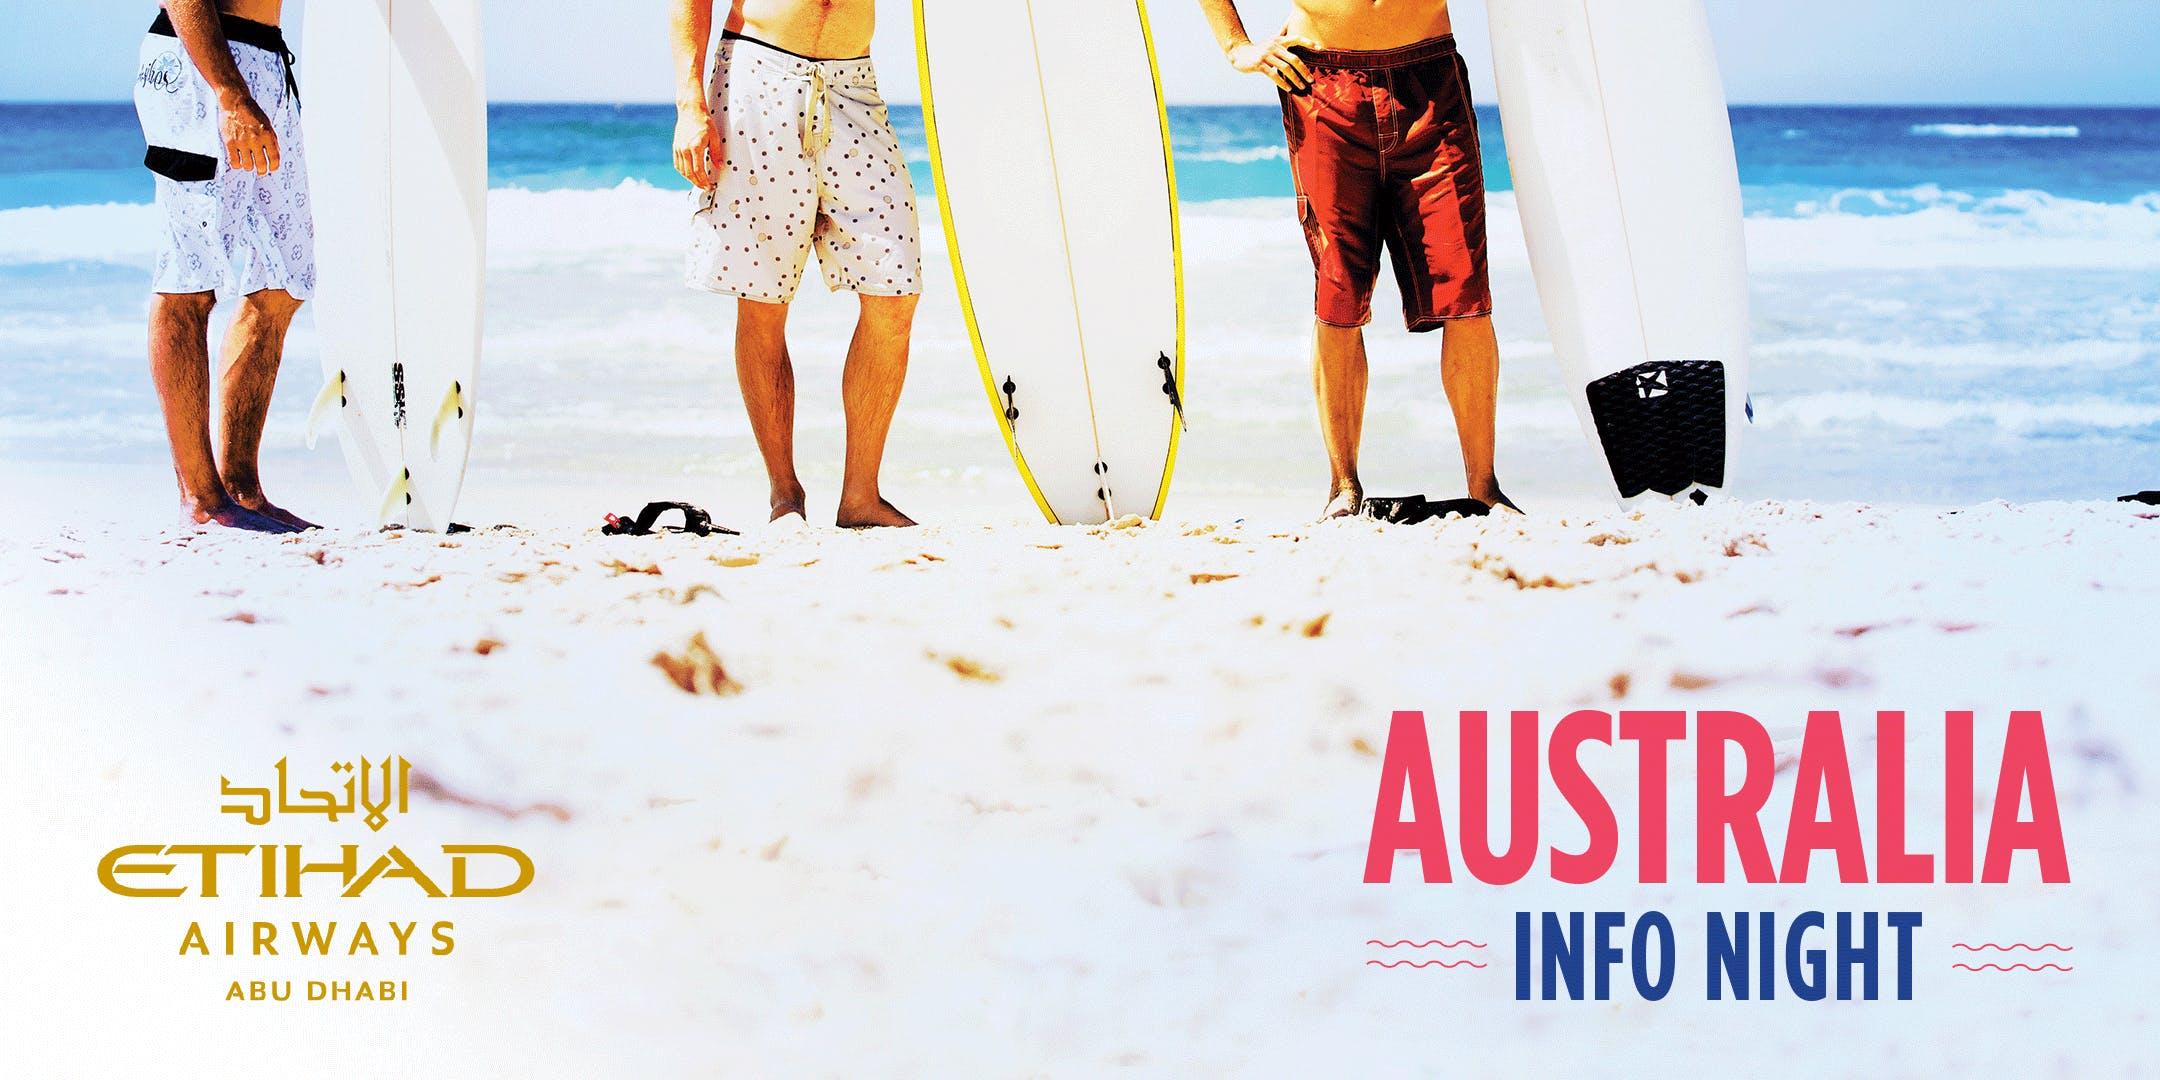 Australia Working Holiday Visa Info Night with USIT, Limerick 22nd May